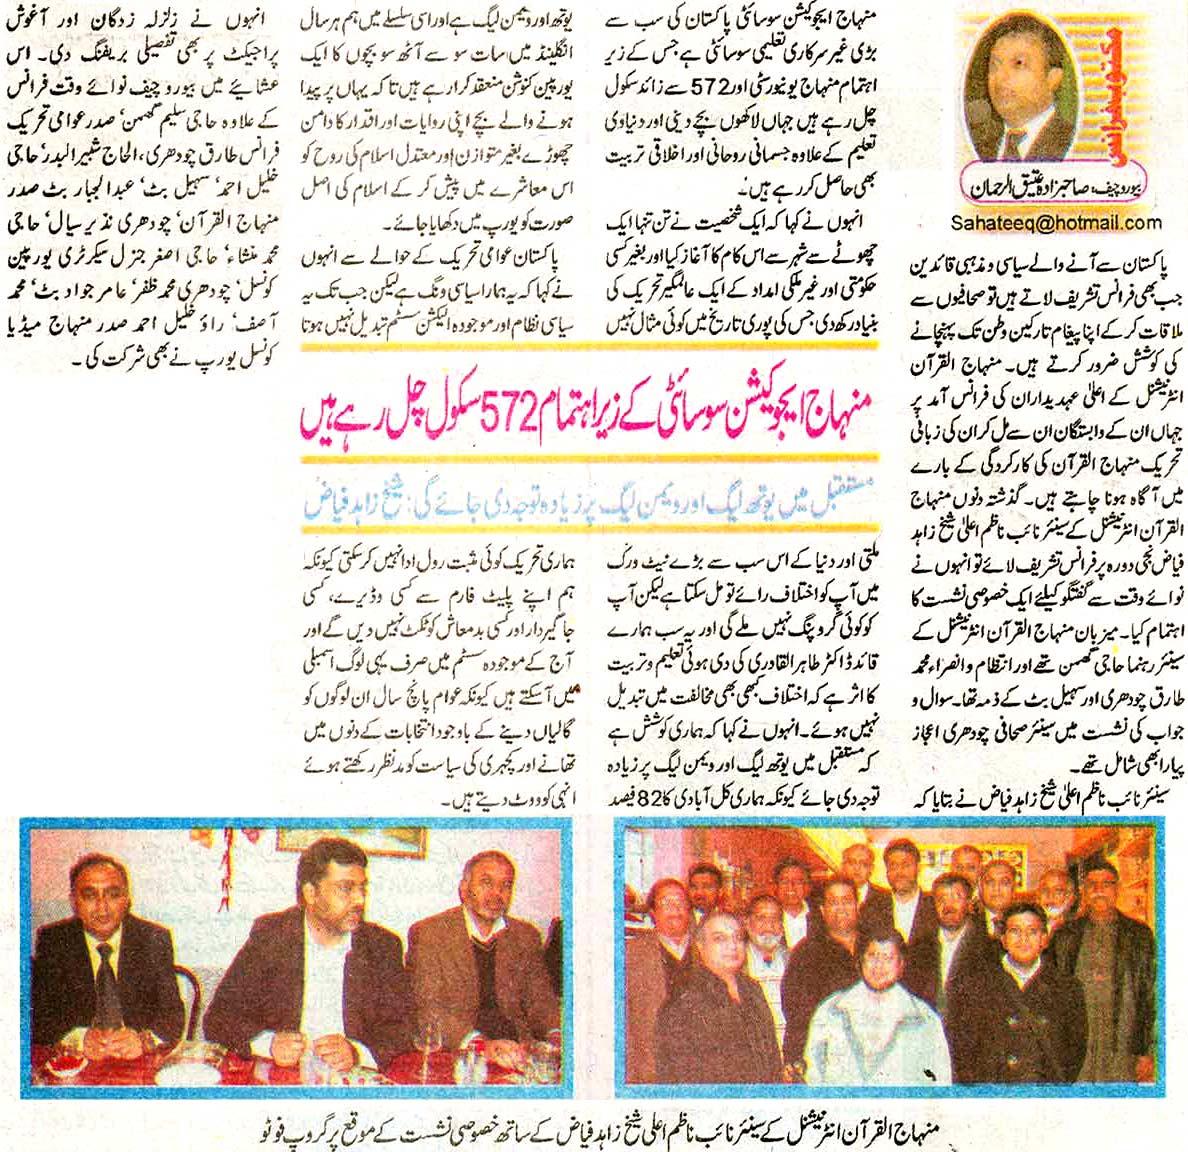 تحریک منہاج القرآن Minhaj-ul-Quran  Print Media Coverage پرنٹ میڈیا کوریج Daily Nawa i Waqt